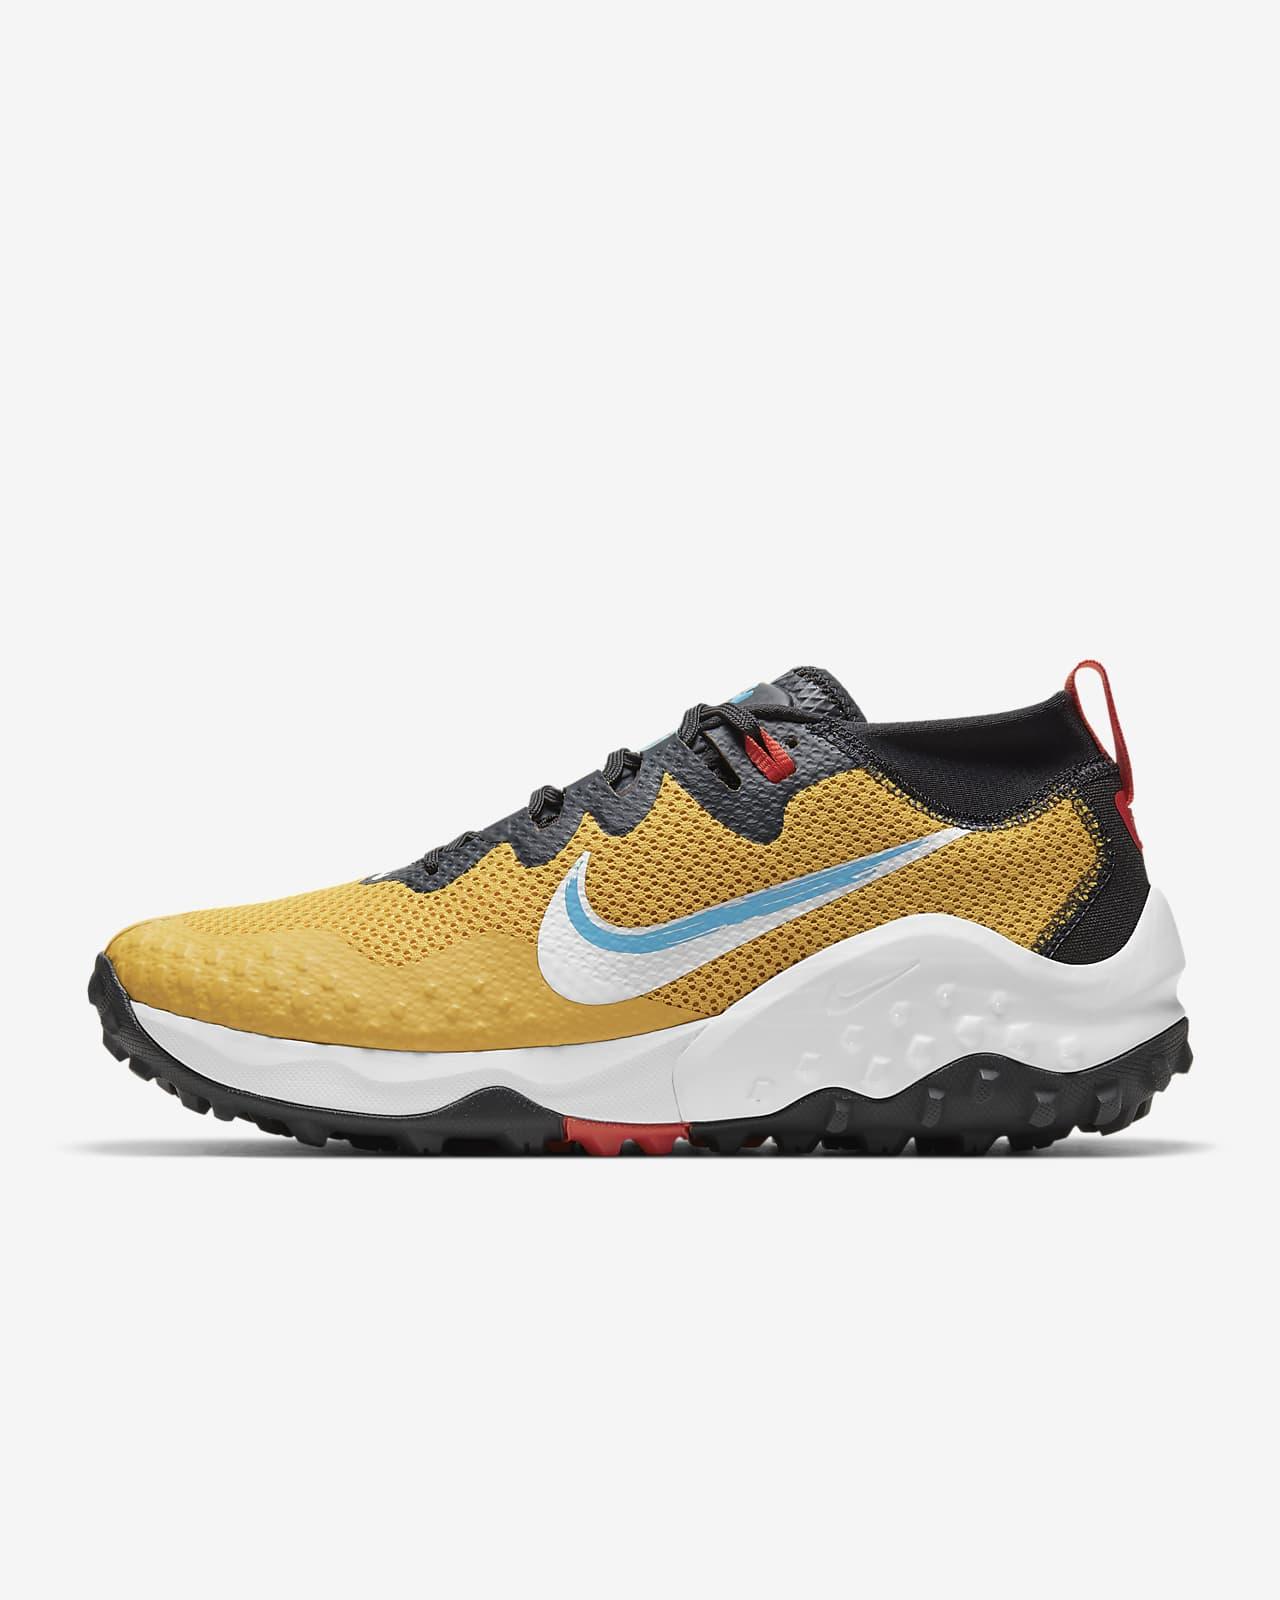 Calzado de trail running para hombre Nike Wildhorse 7